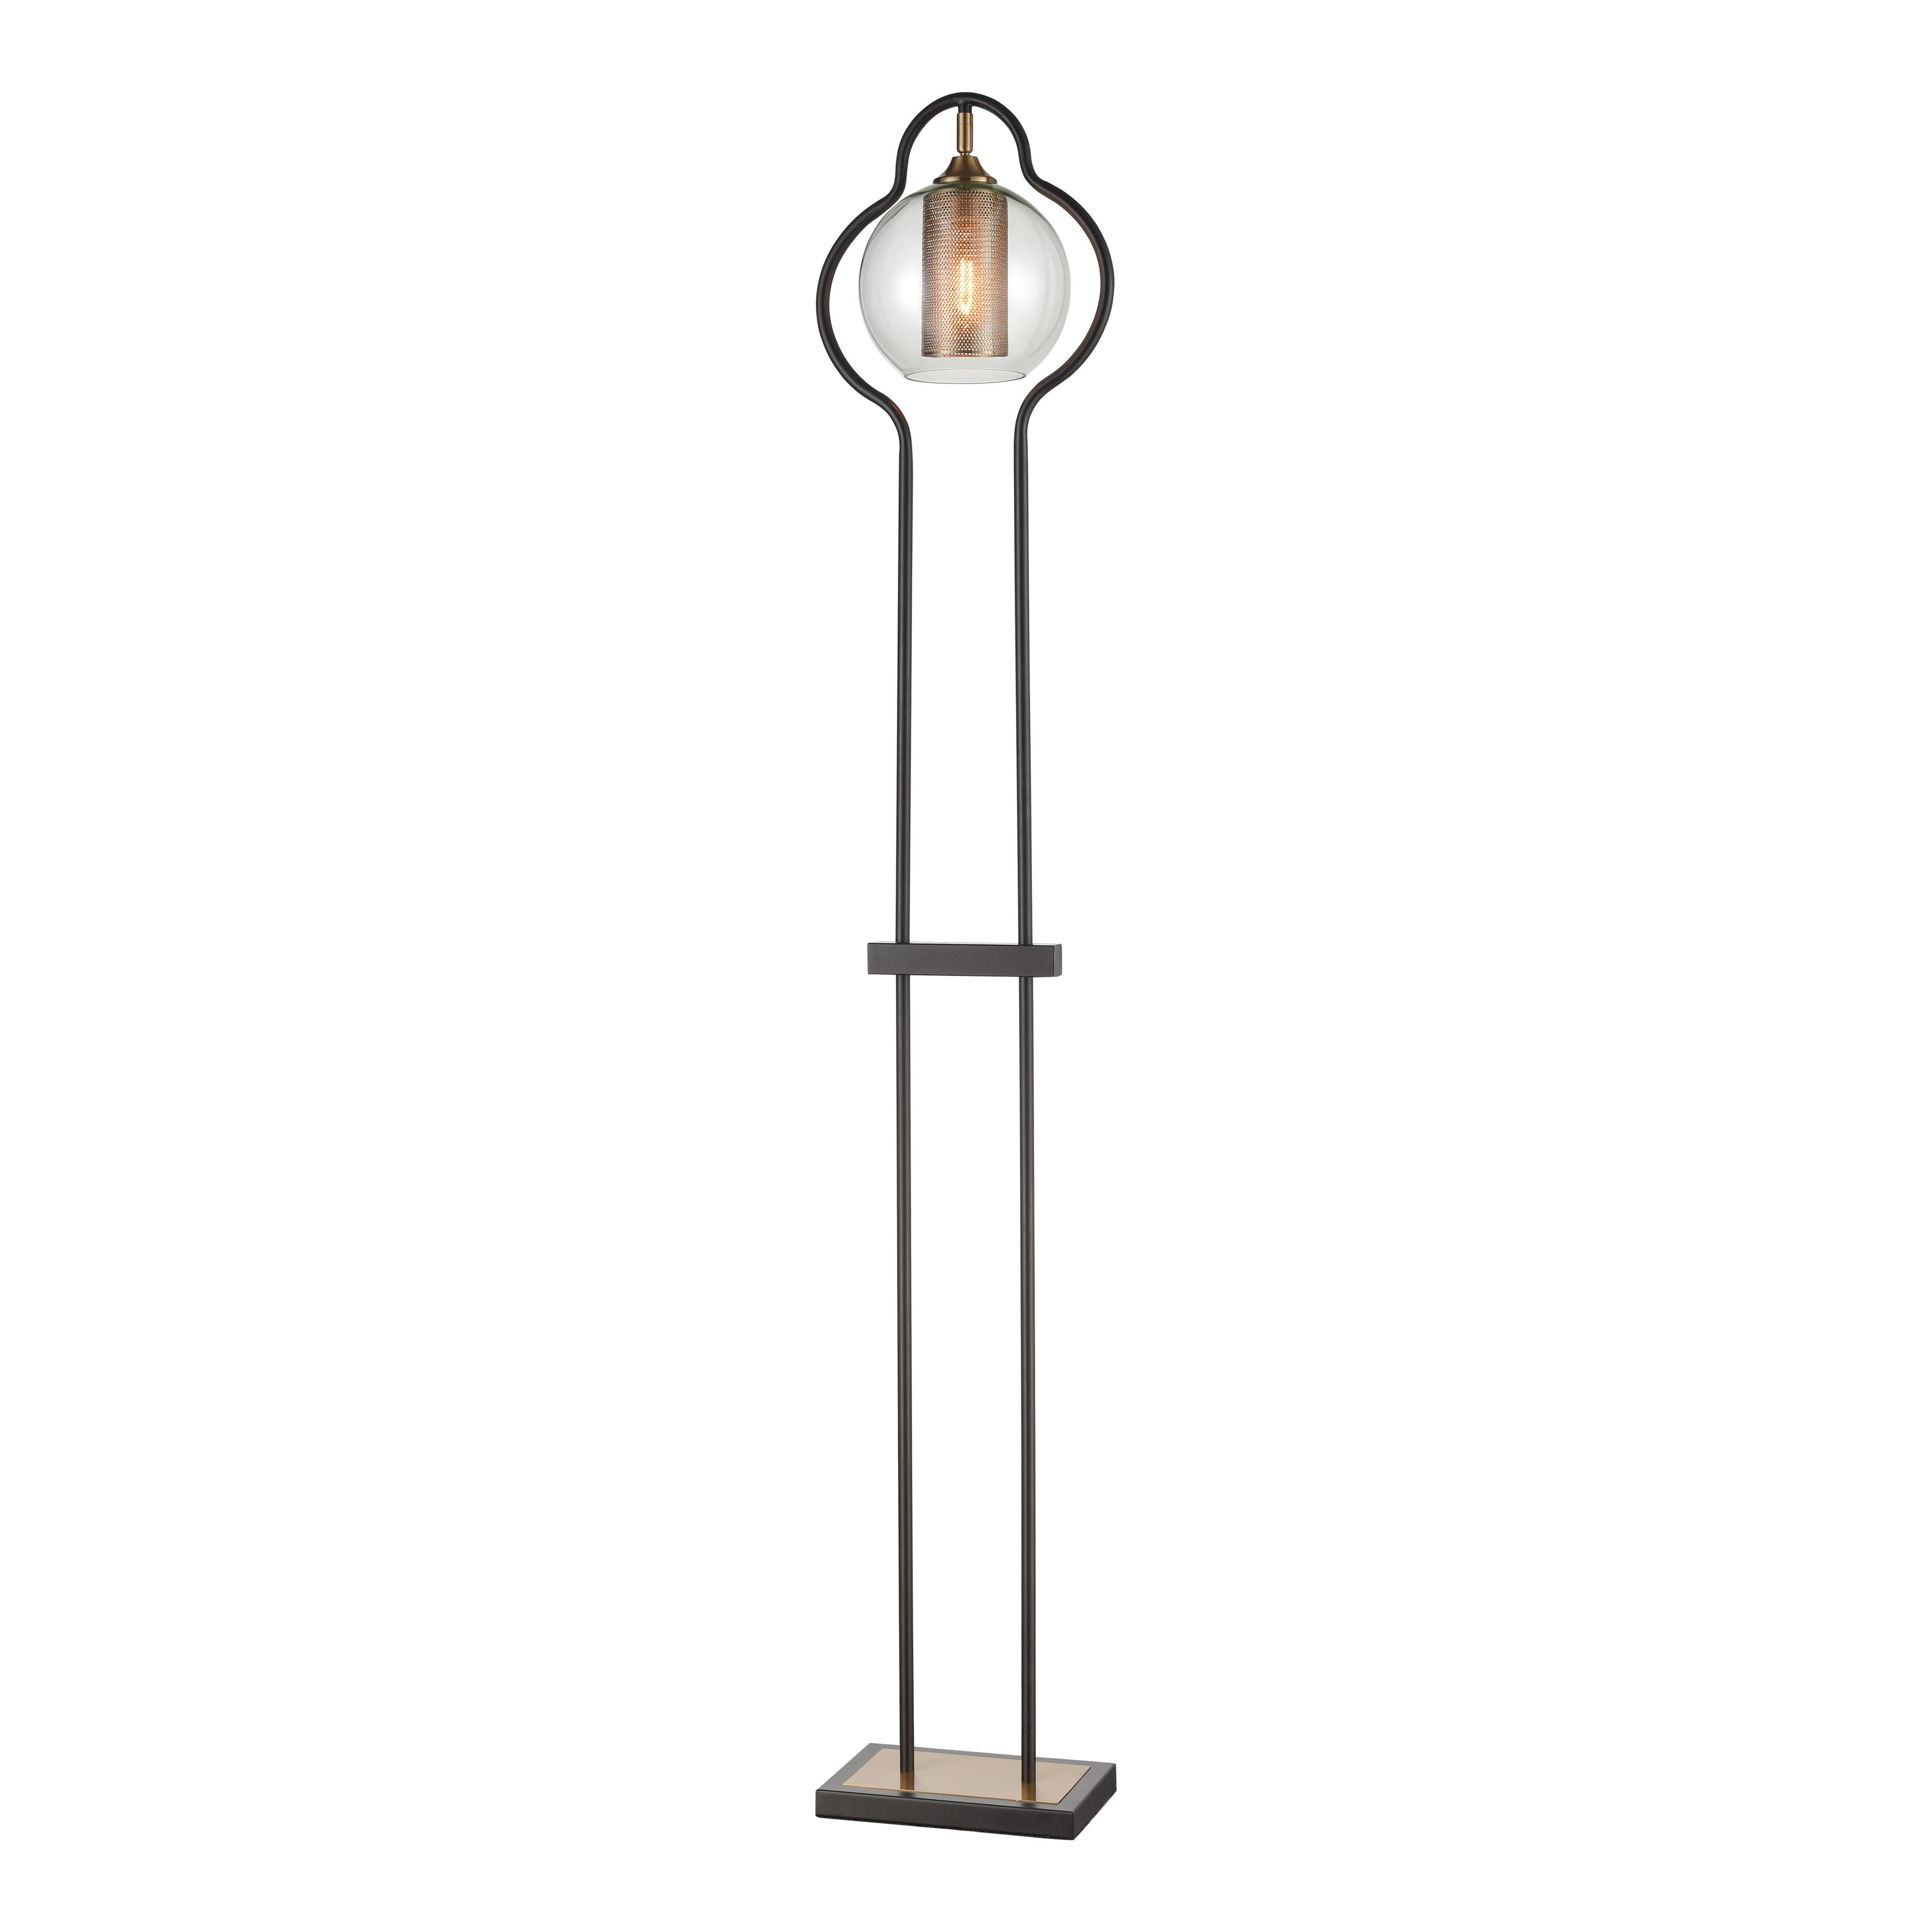 Stein World Bremington Floor Lamp